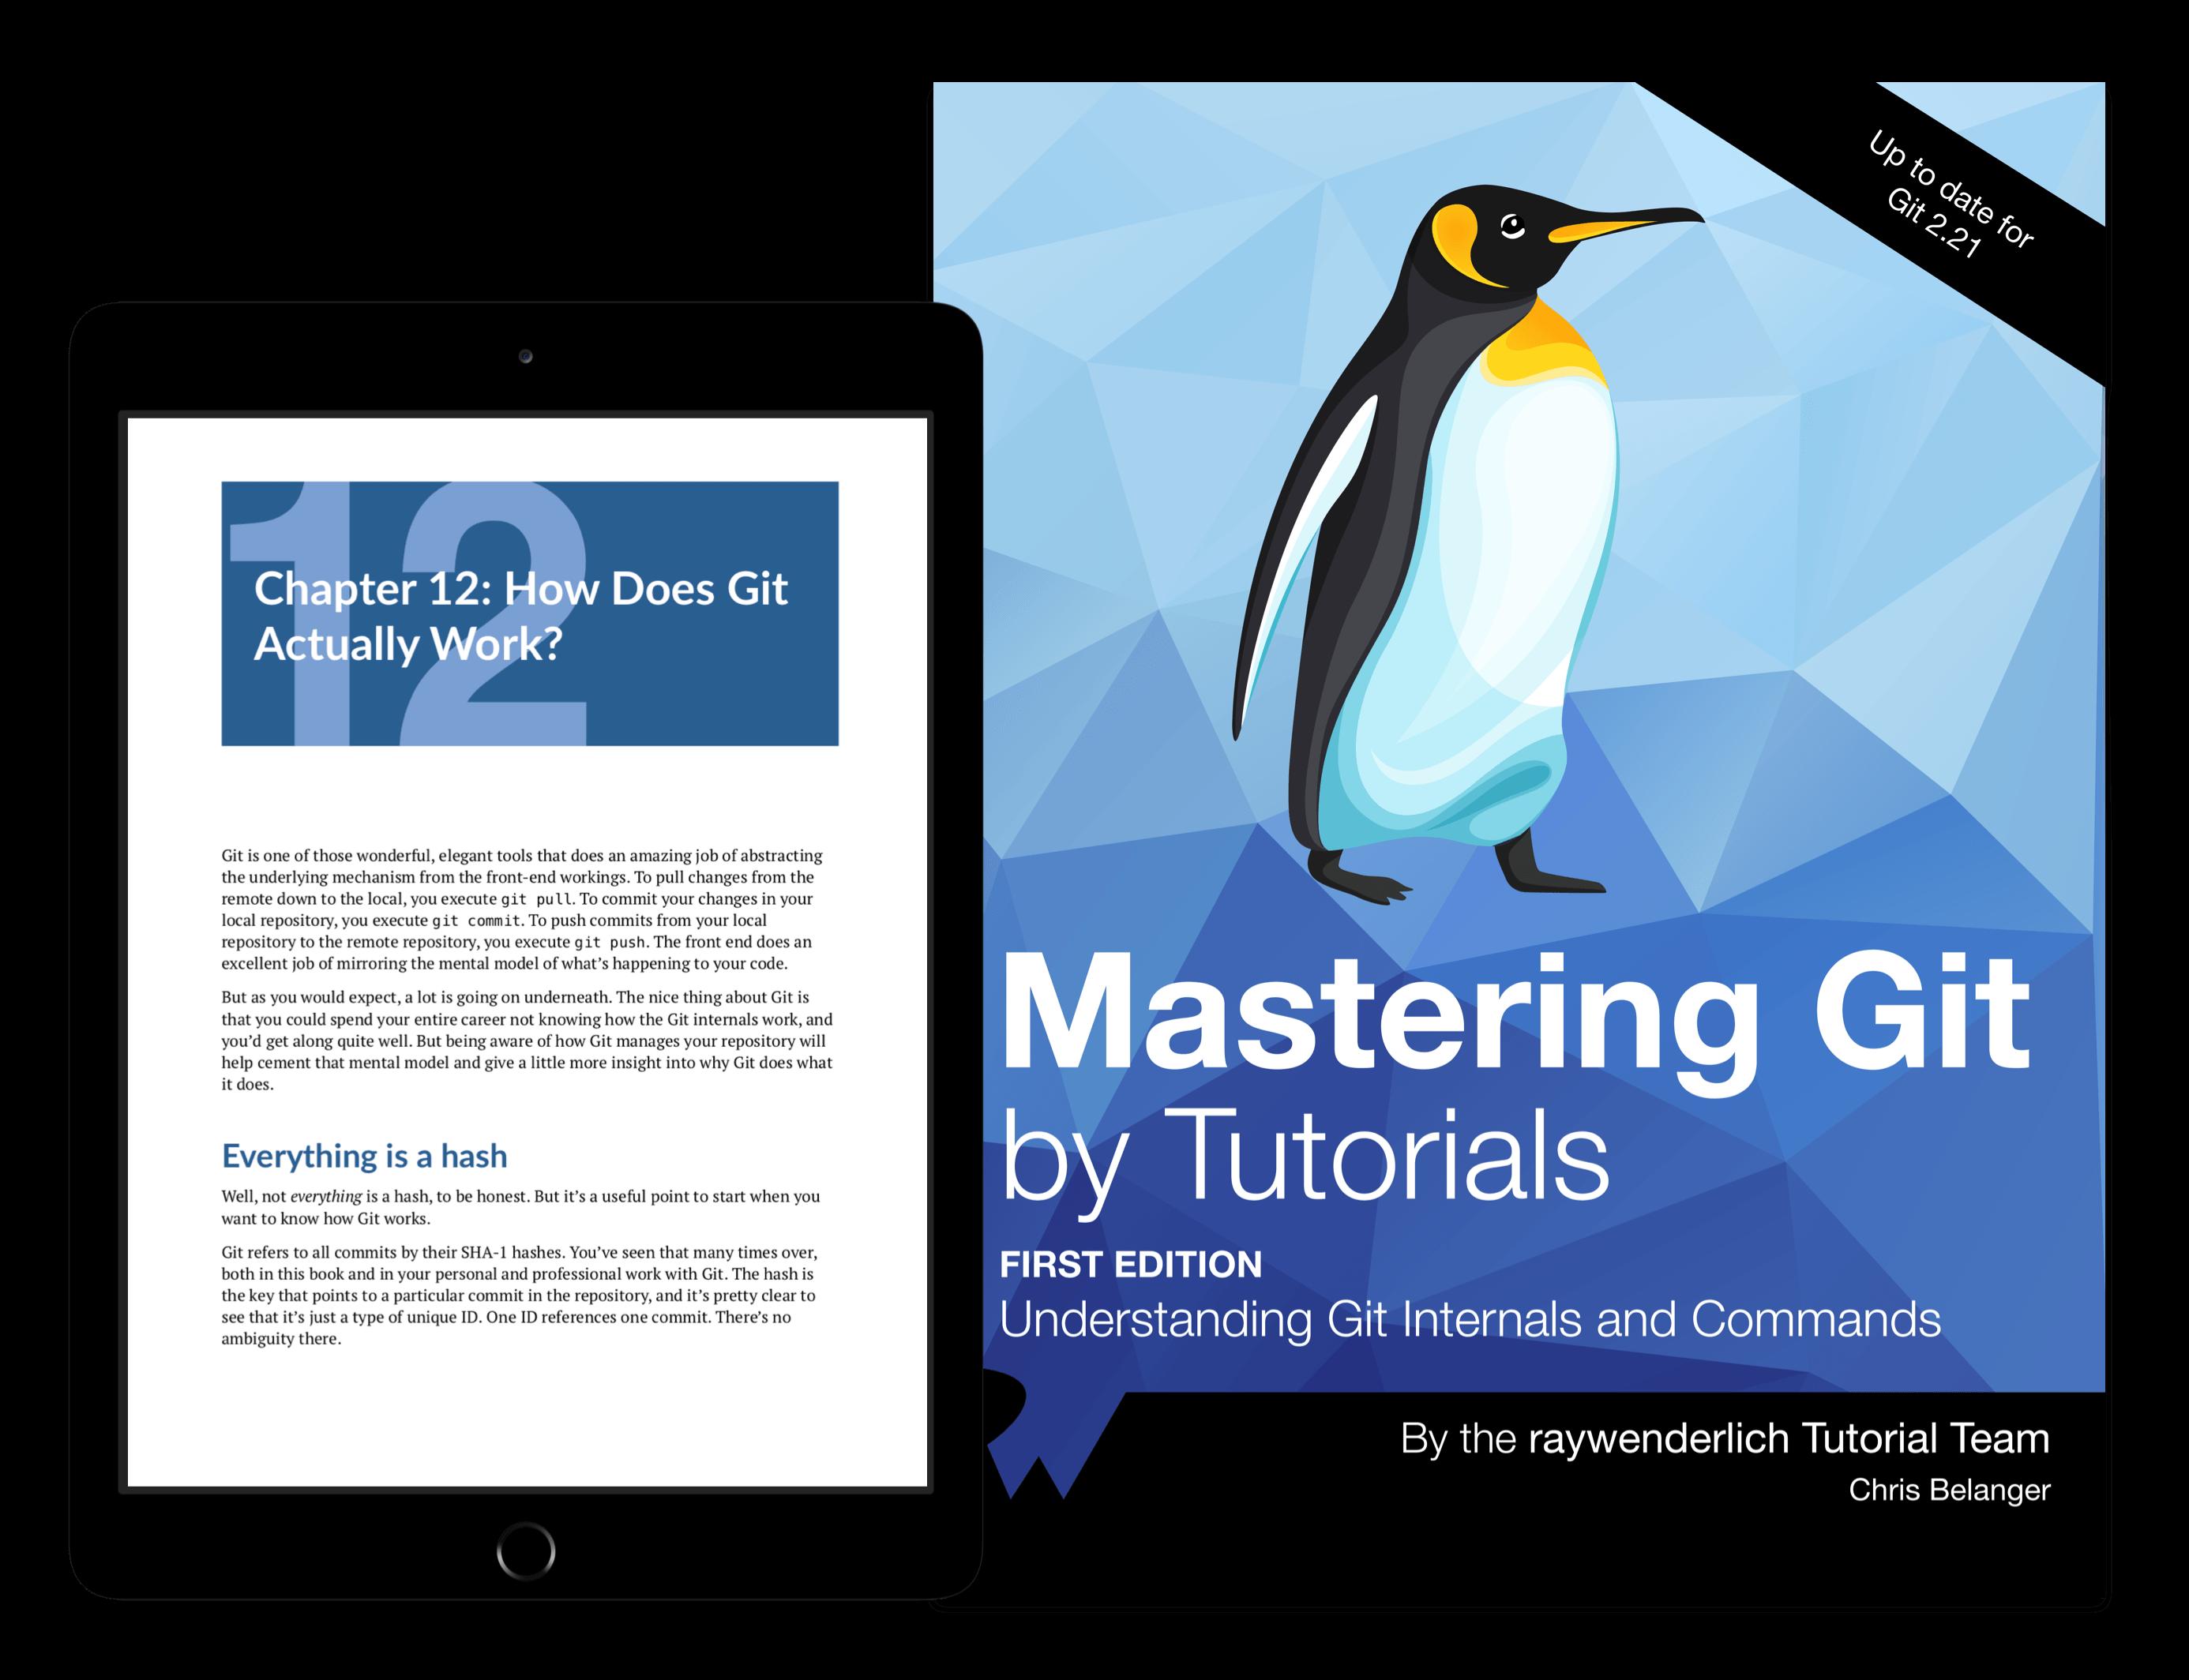 Mastering Git by Tutorials